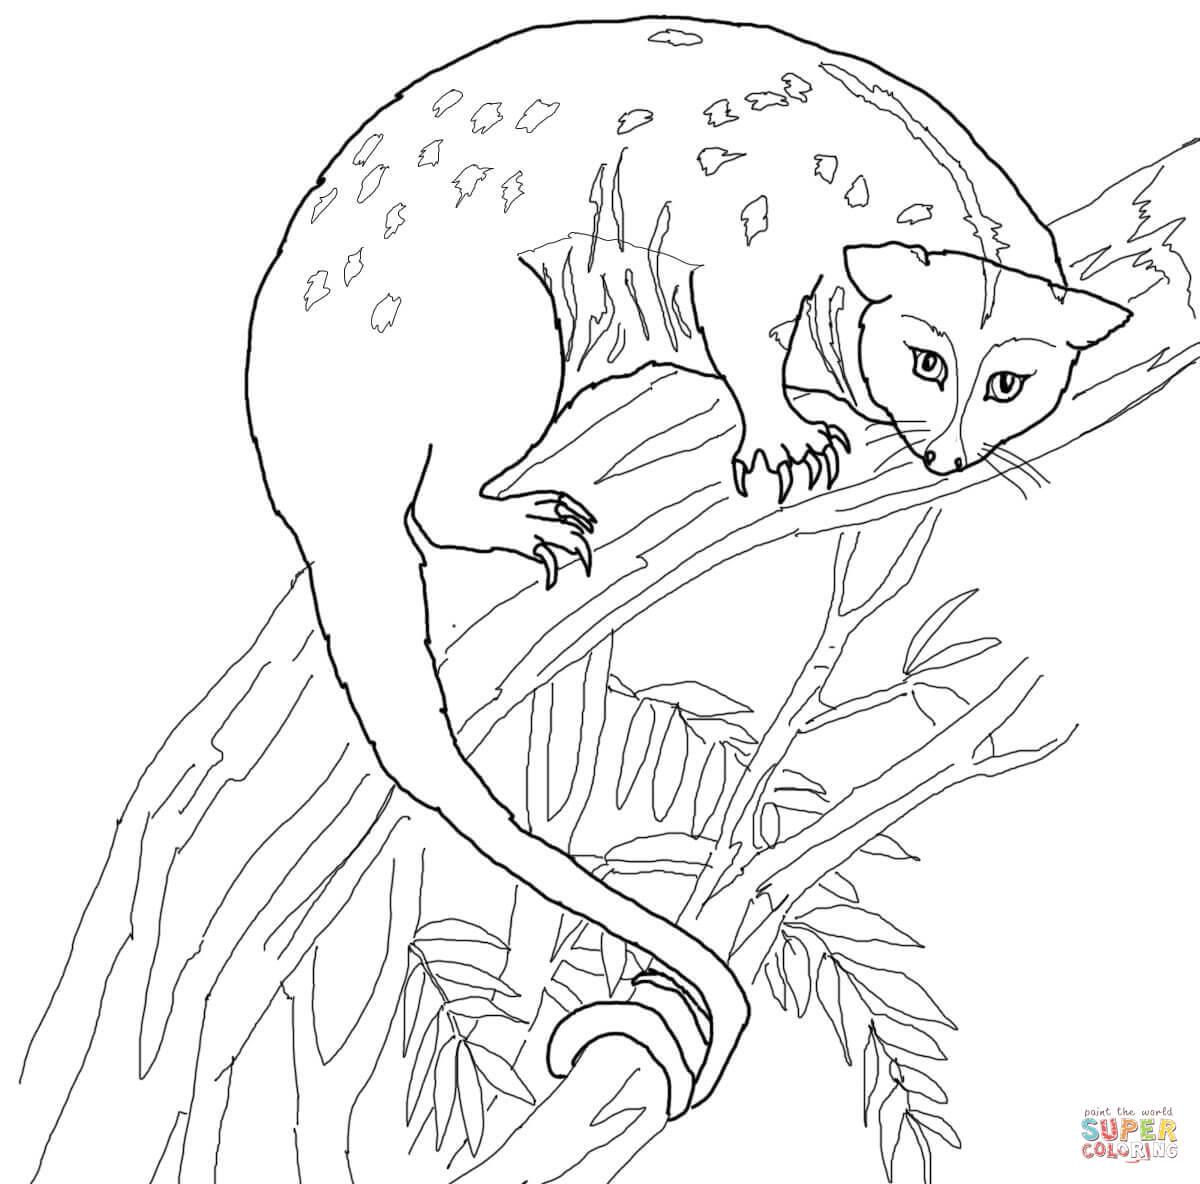 Cuscus coloring #6, Download drawings